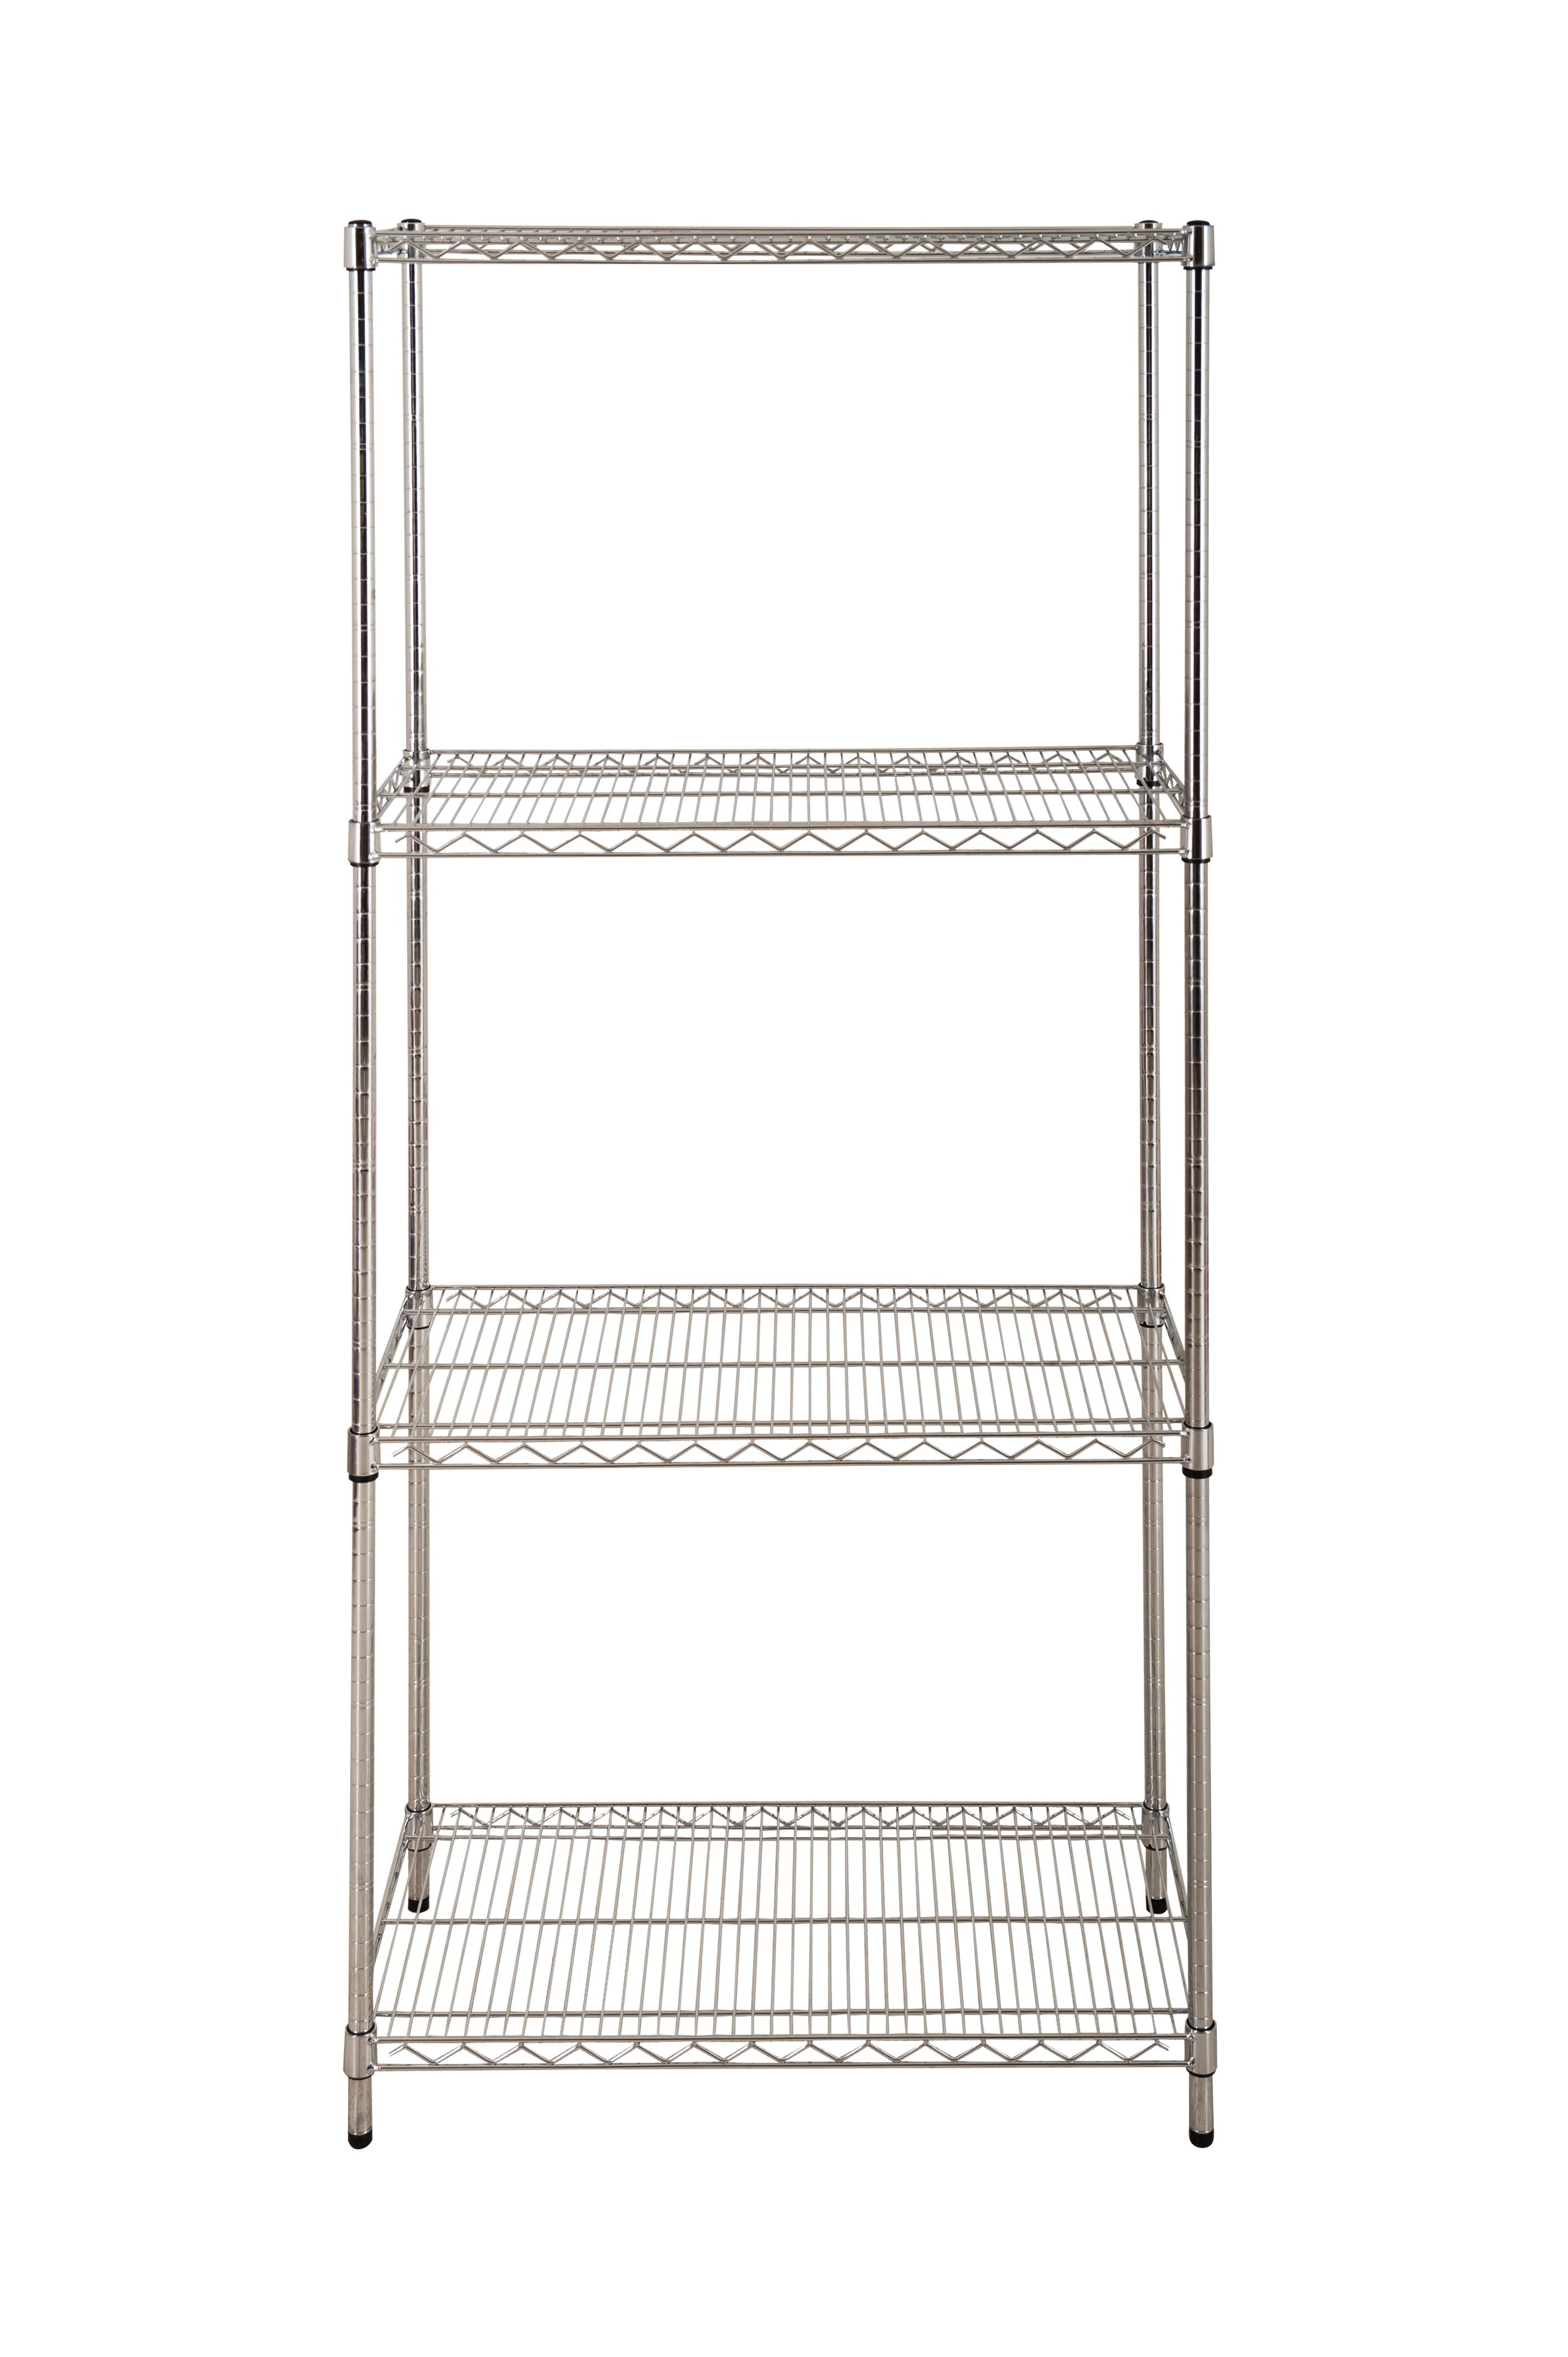 4 Shelf Chrome Starter Bay - 1600 x 915 x 355